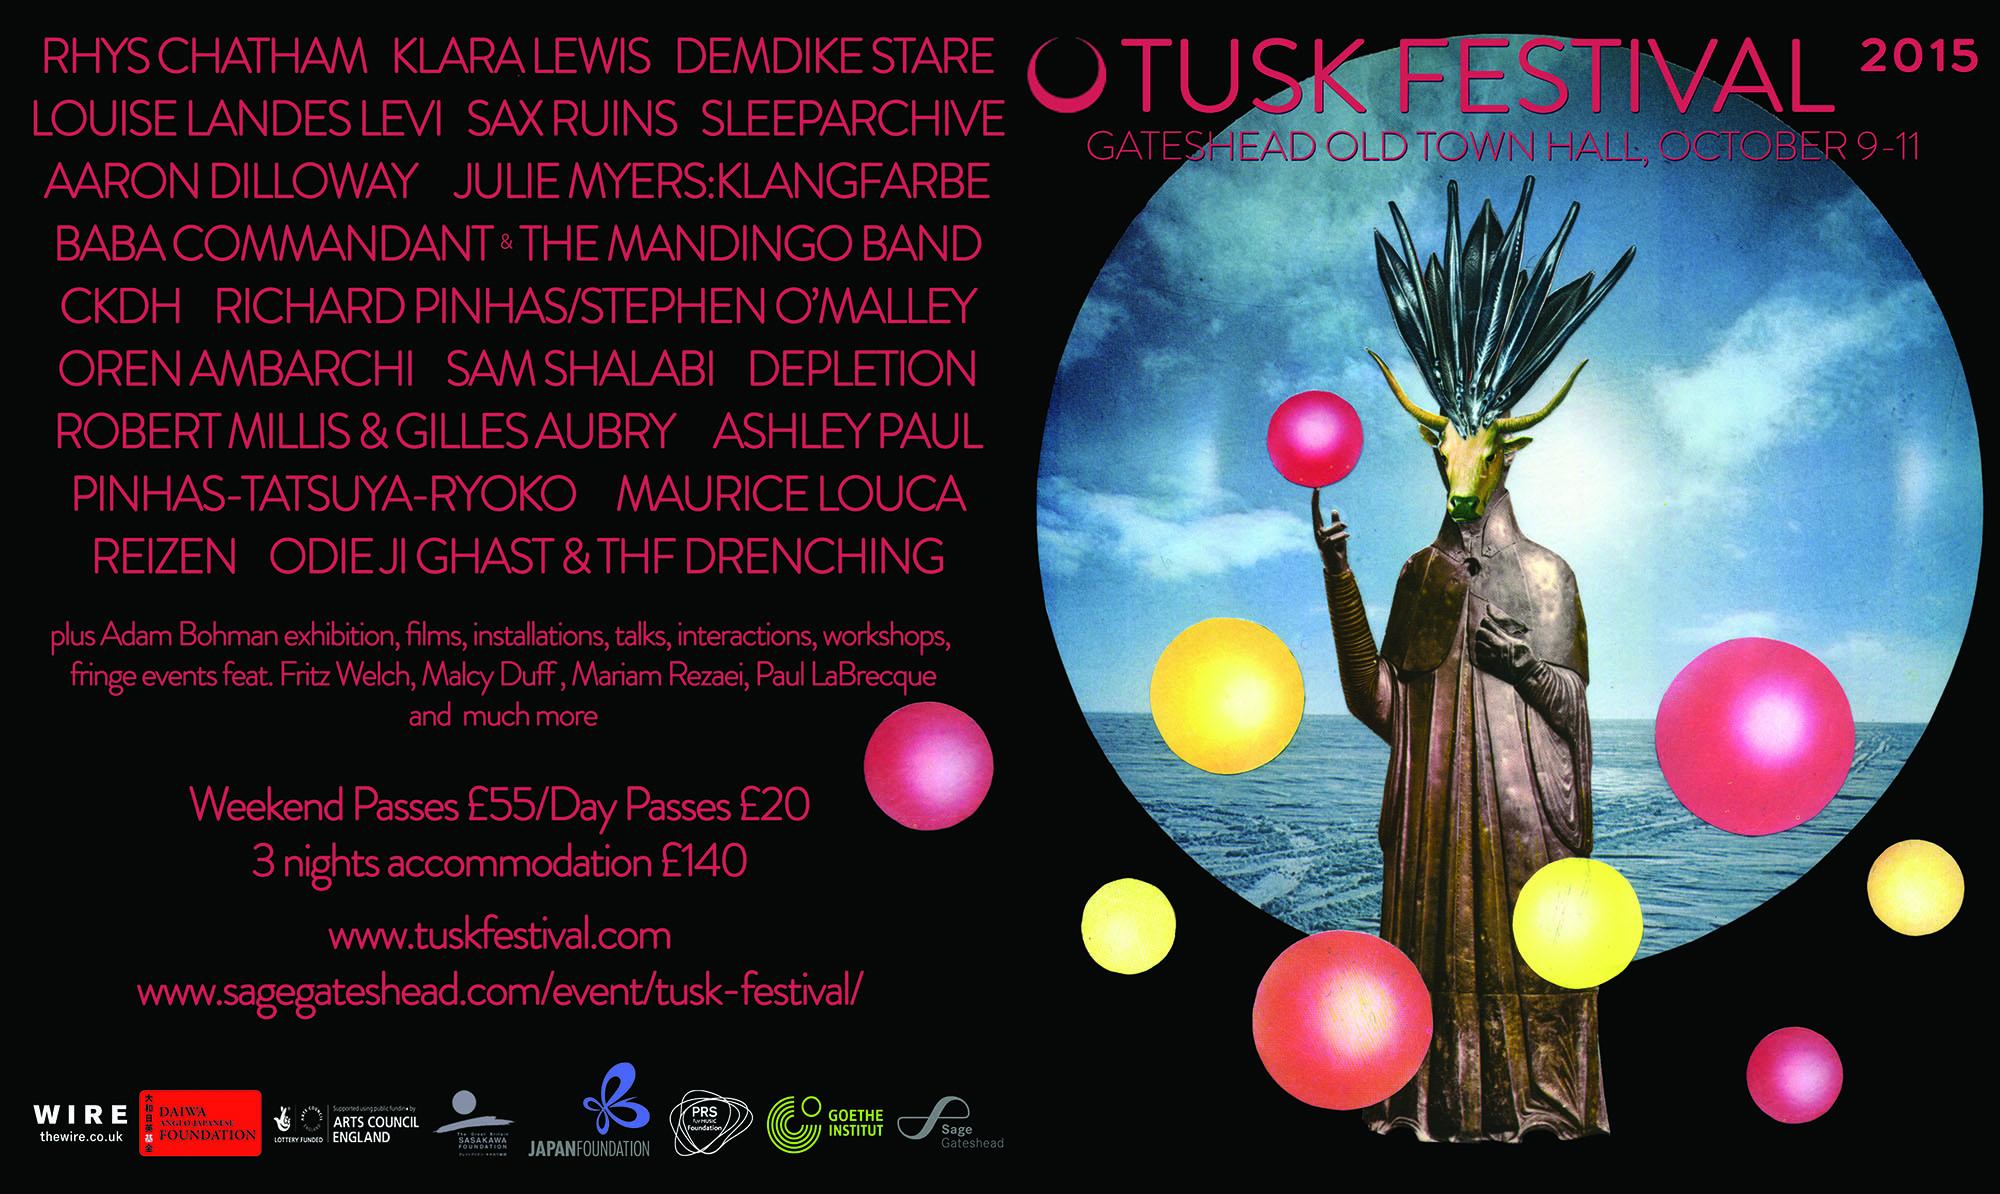 Richard Pinhas & Stephen O'Malley duo @ TUSK Festival